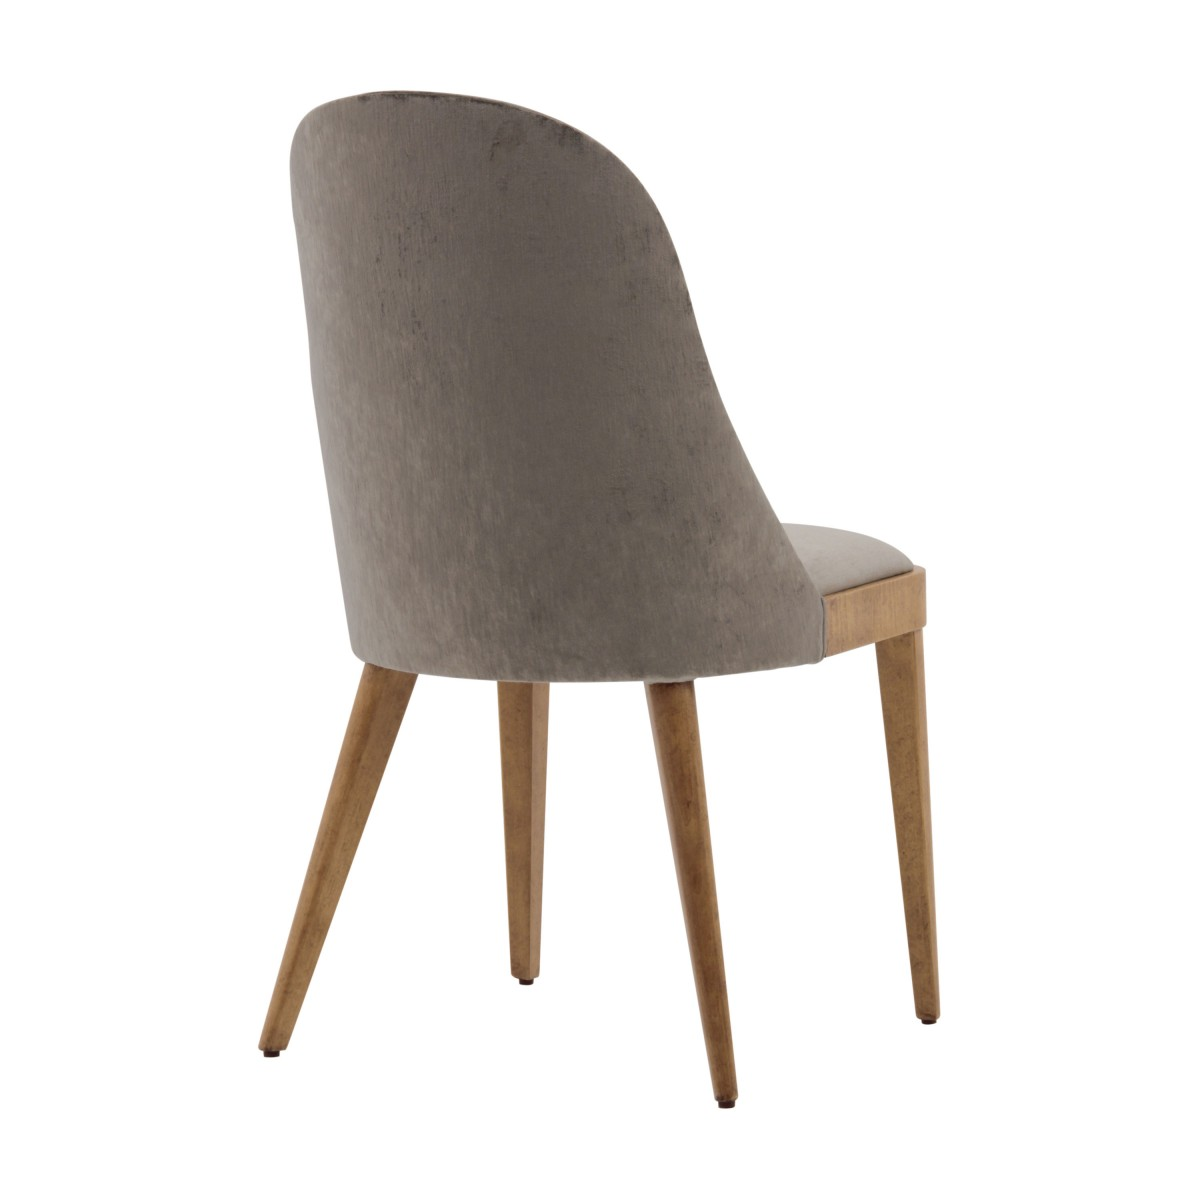 italian modern chair svezia 4 3801